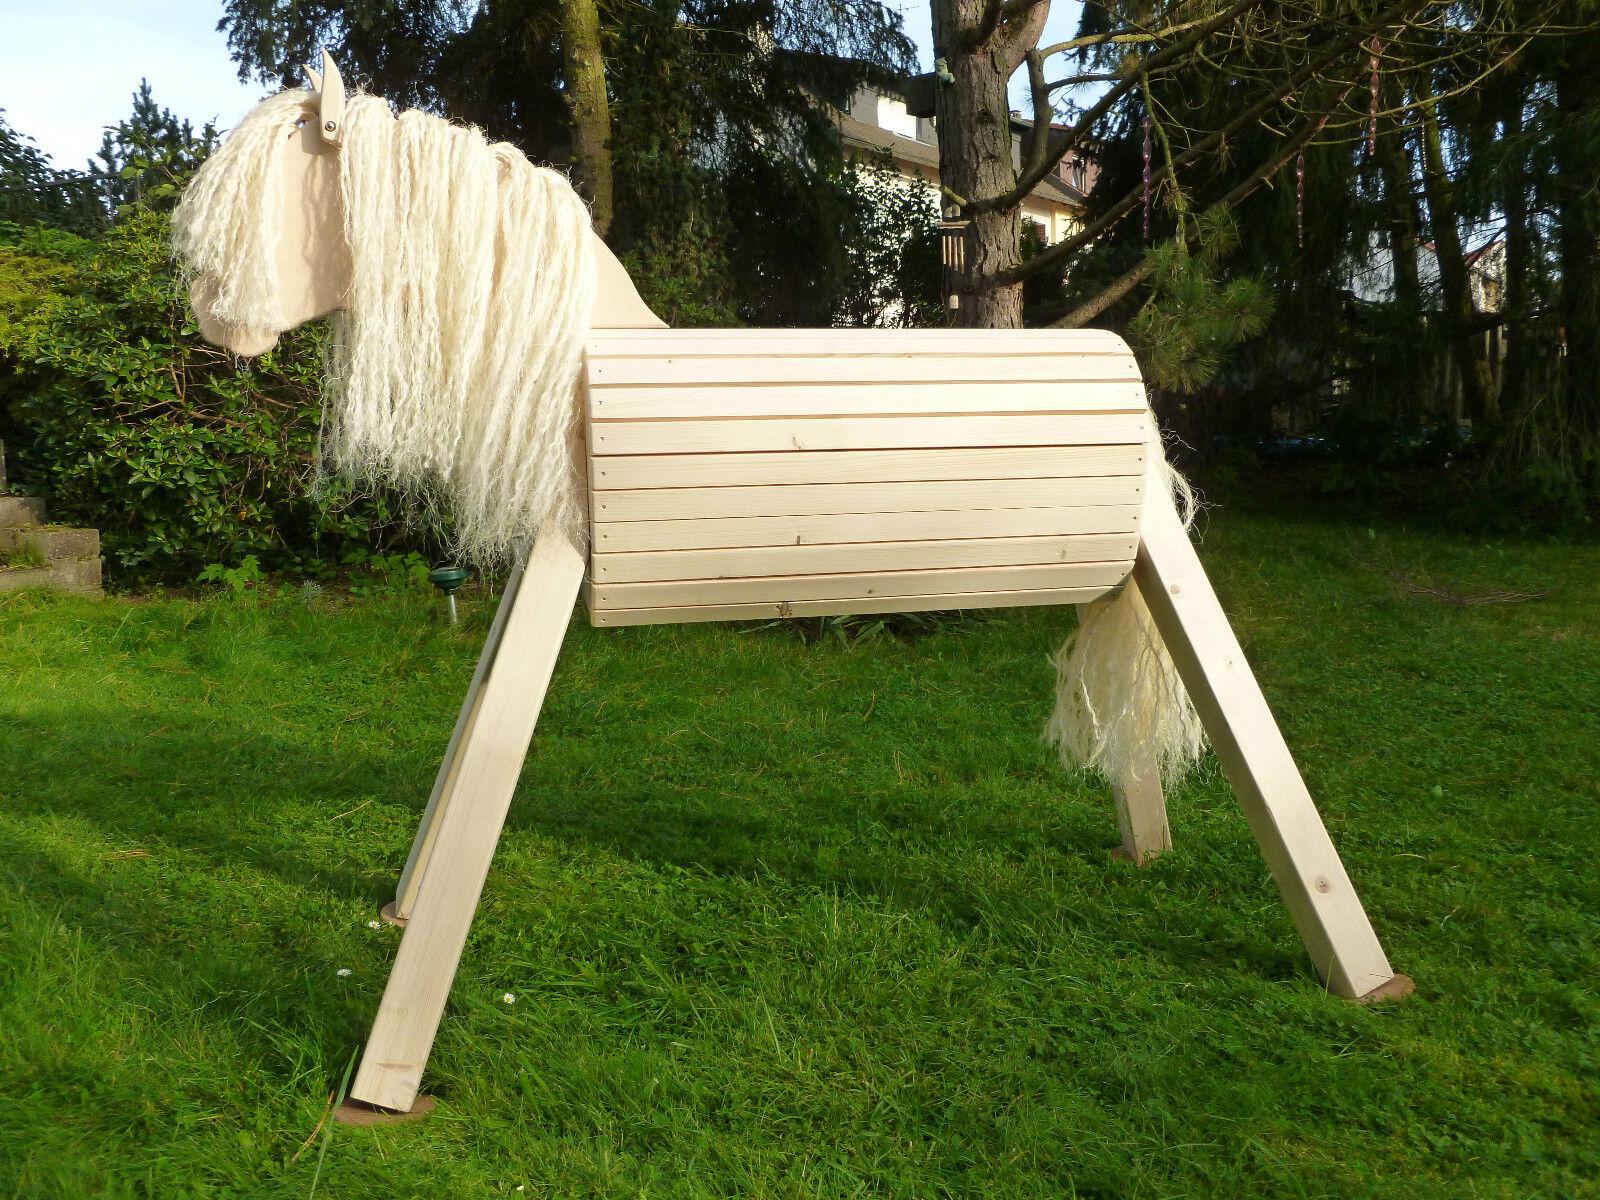 75cm Holzpferd Holzpony Voltigierpferd Spielpferd Pferd Pony unlasiert NEU